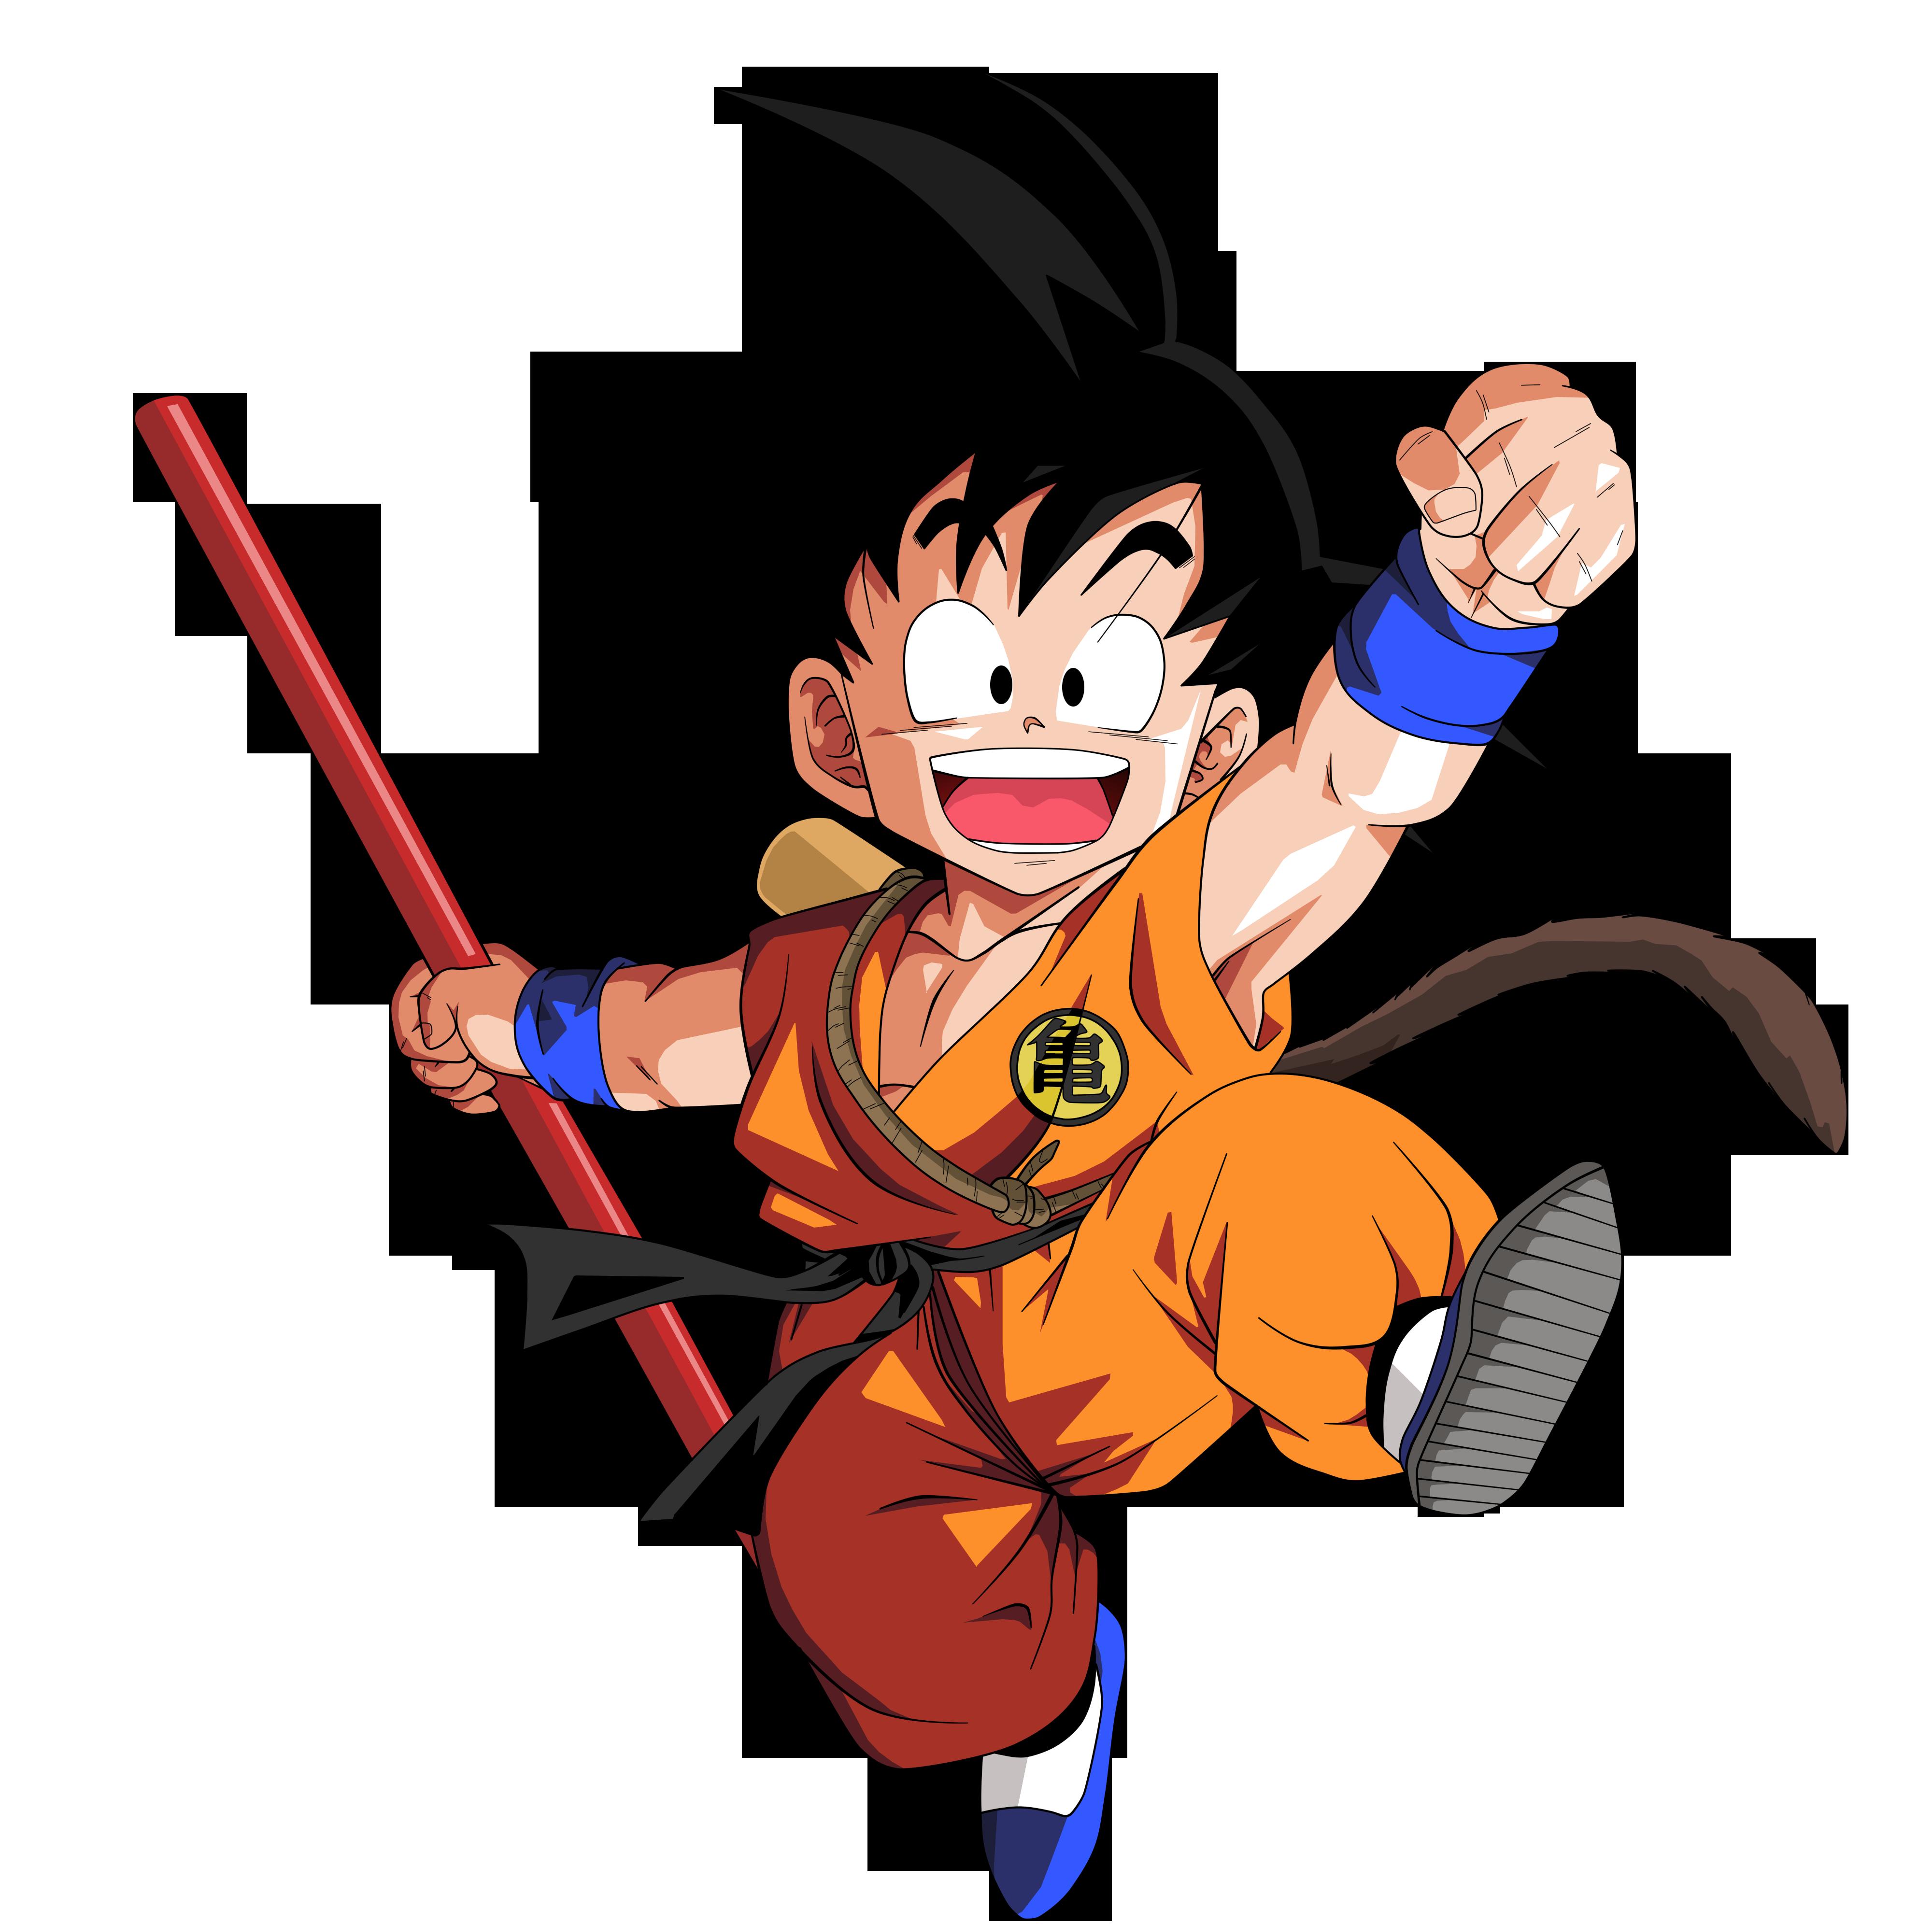 Goku Chico By Bardocksonic On Deviantart